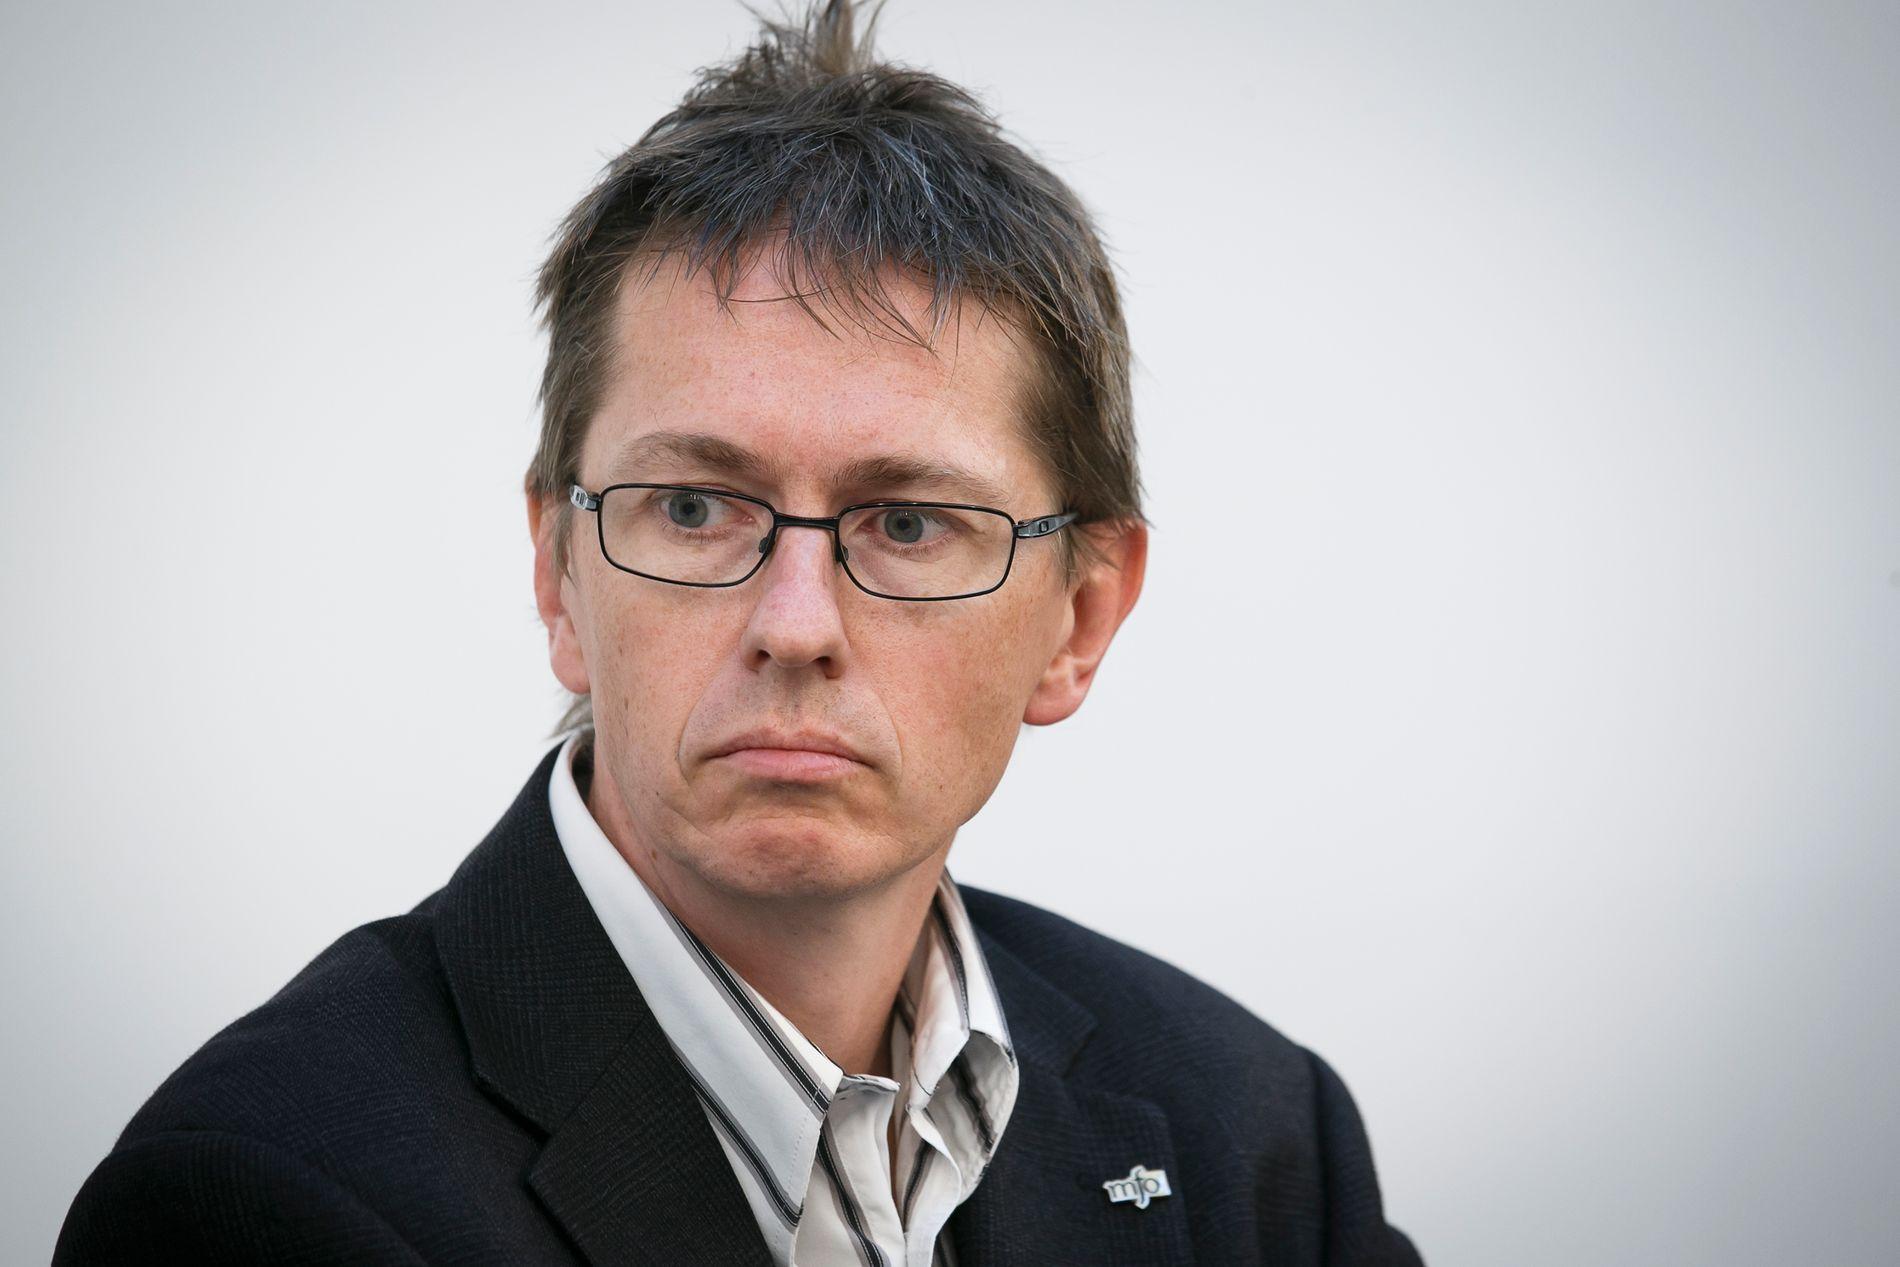 REFSER NRK: Hans Ole Rian i Creo, fagforbund for kunst og kultur.